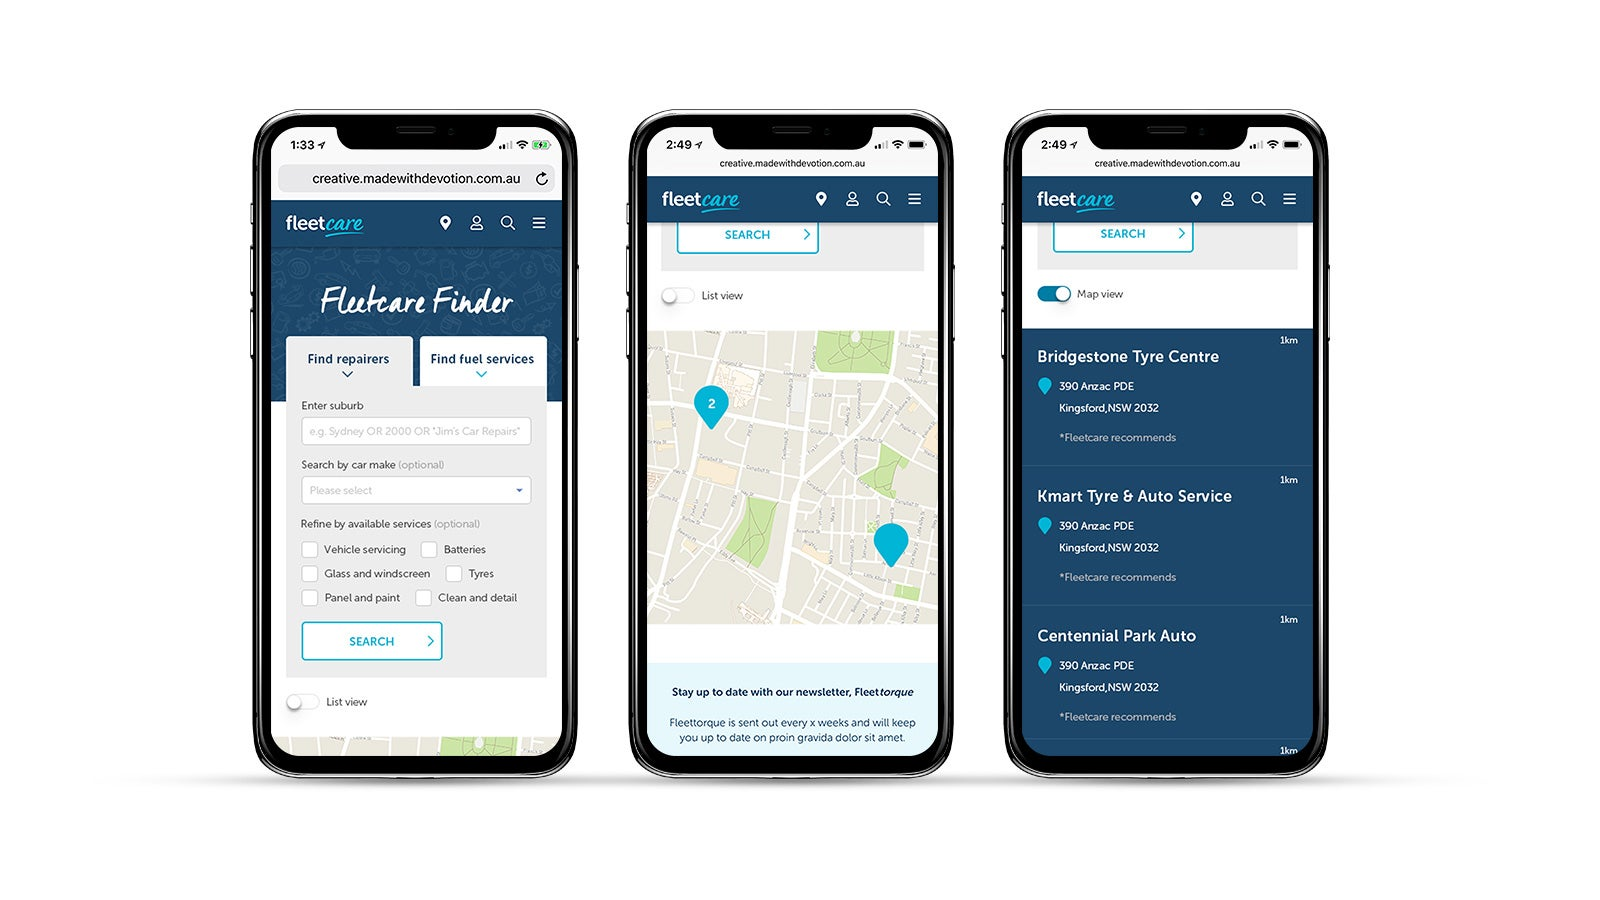 Fleetcare   Fleetcare Finder screens on an iPhone   Devotion